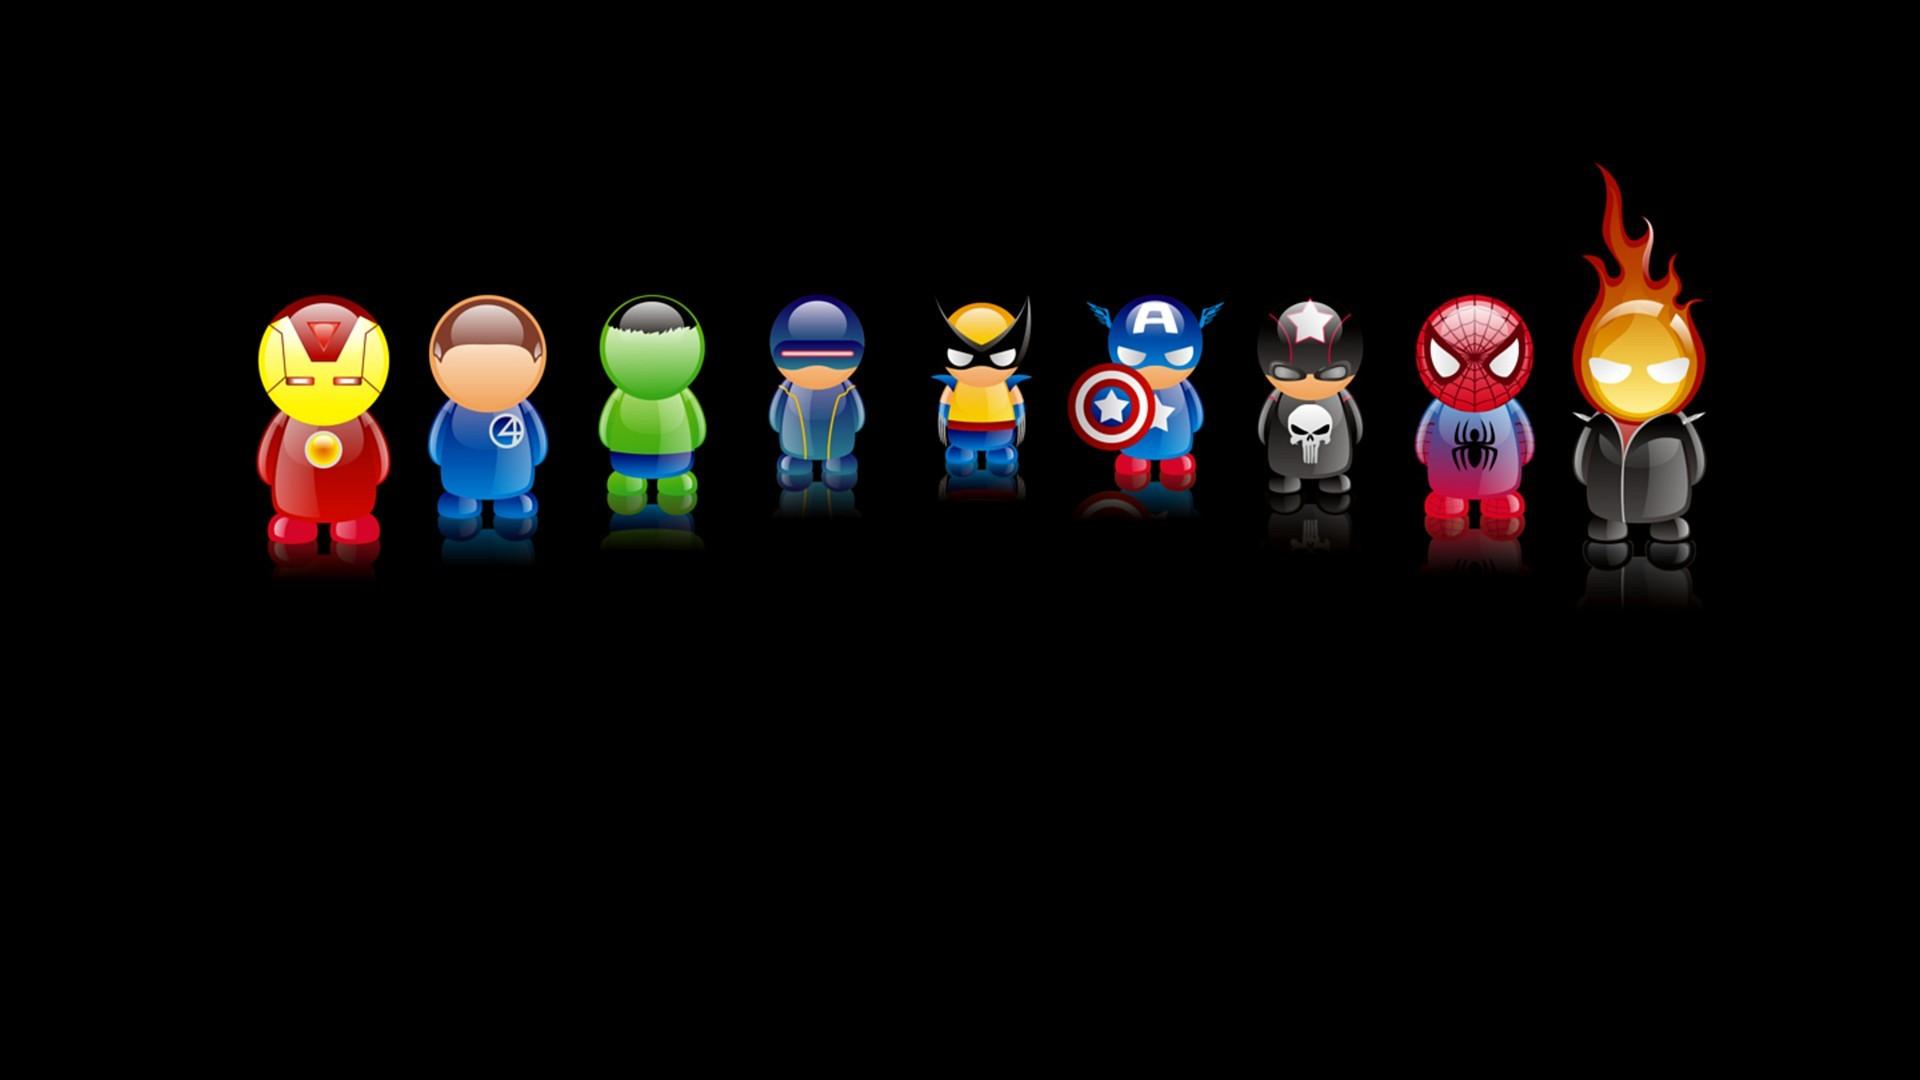 Minimalist marvel wallpaper 77 images - Avengers superhero wallpaper ...